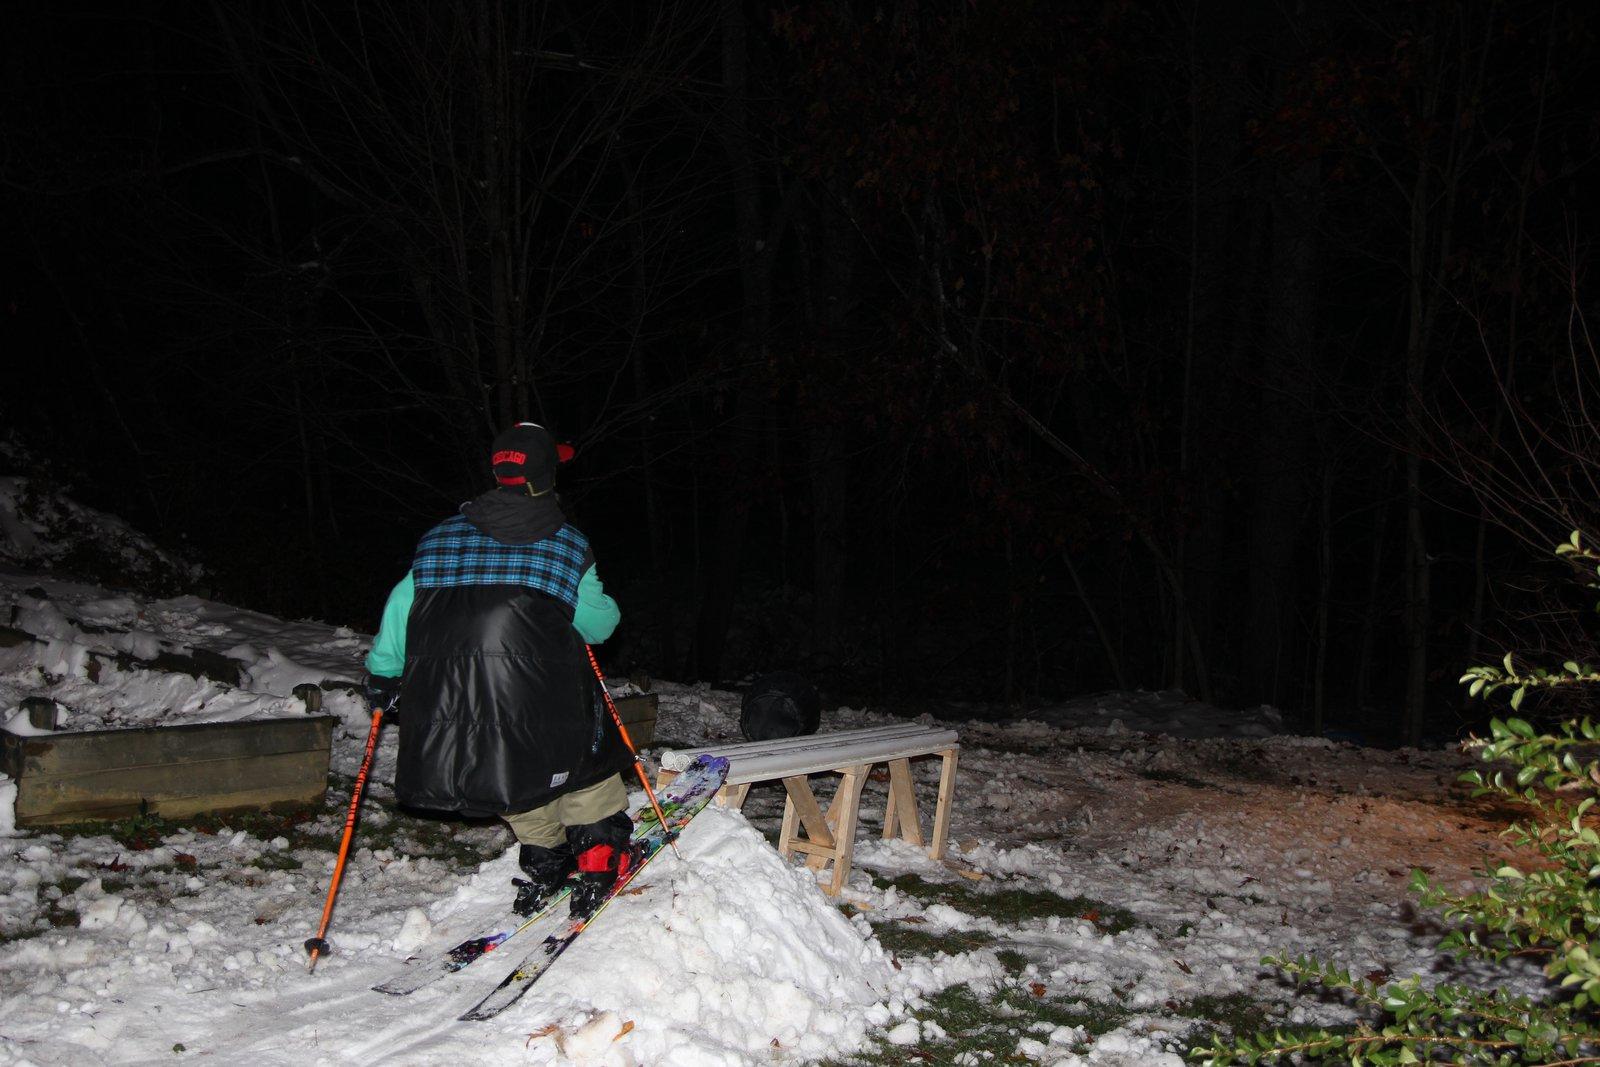 Halloween skiing